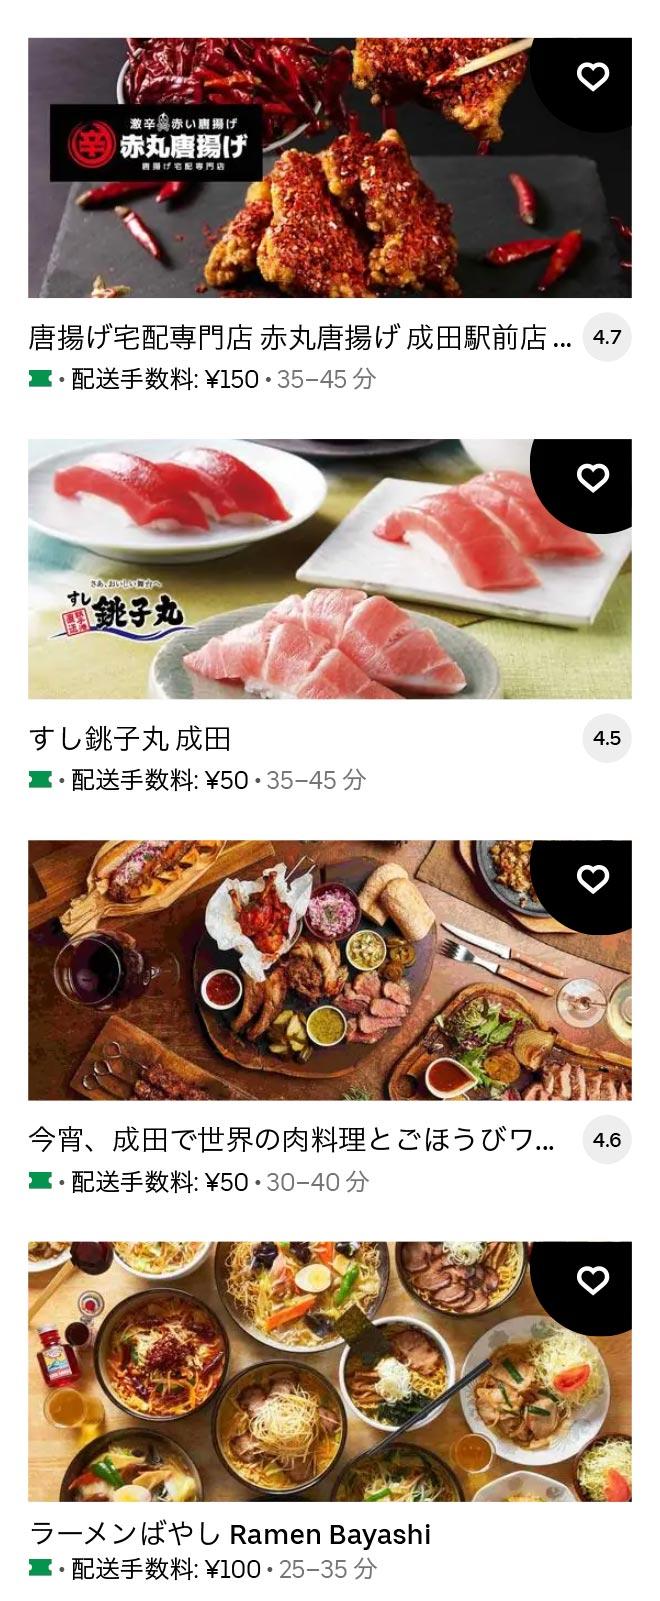 U narita menu 2104 09